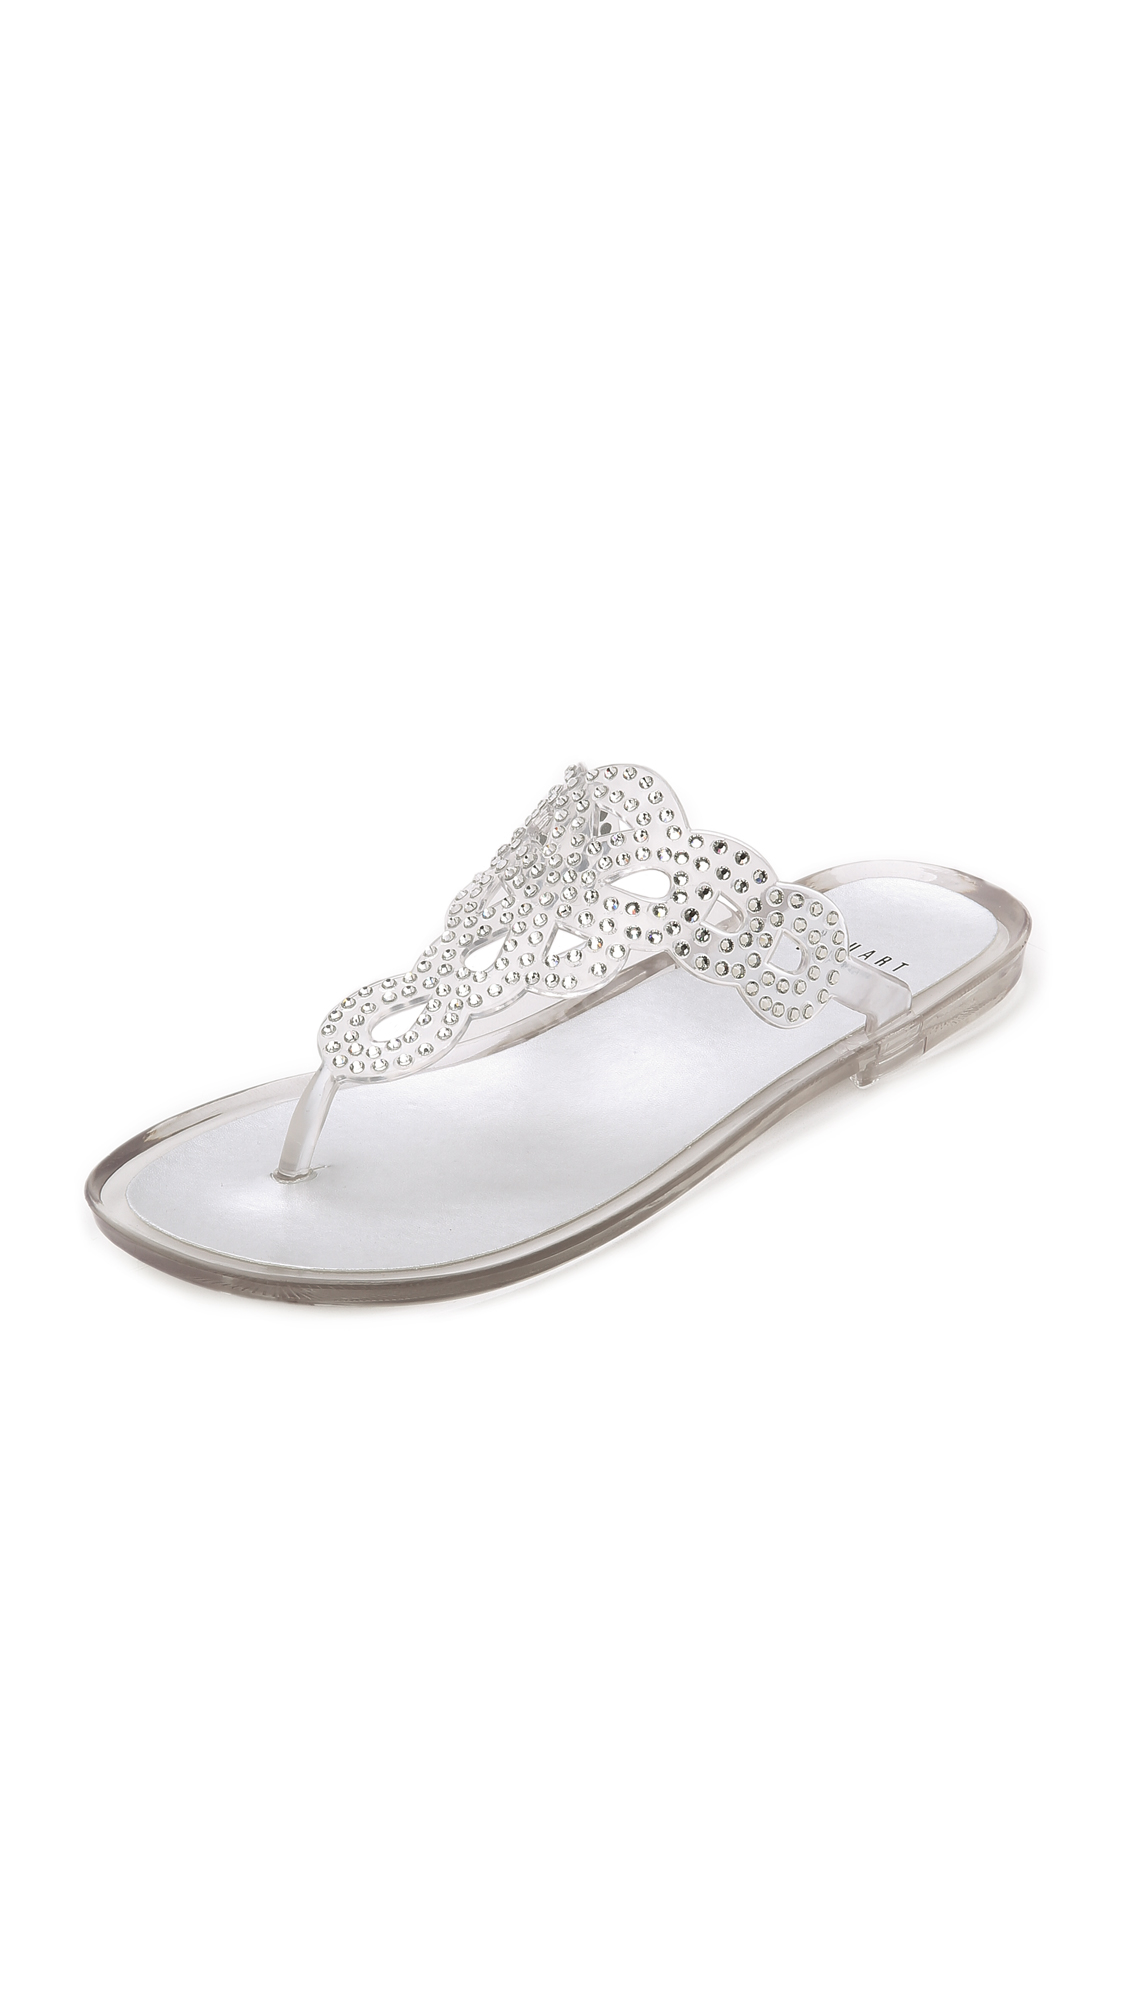 c0834f18bc83 Stuart Weitzman Mermaid Jelly Thong Sandals - Clear - Lyst